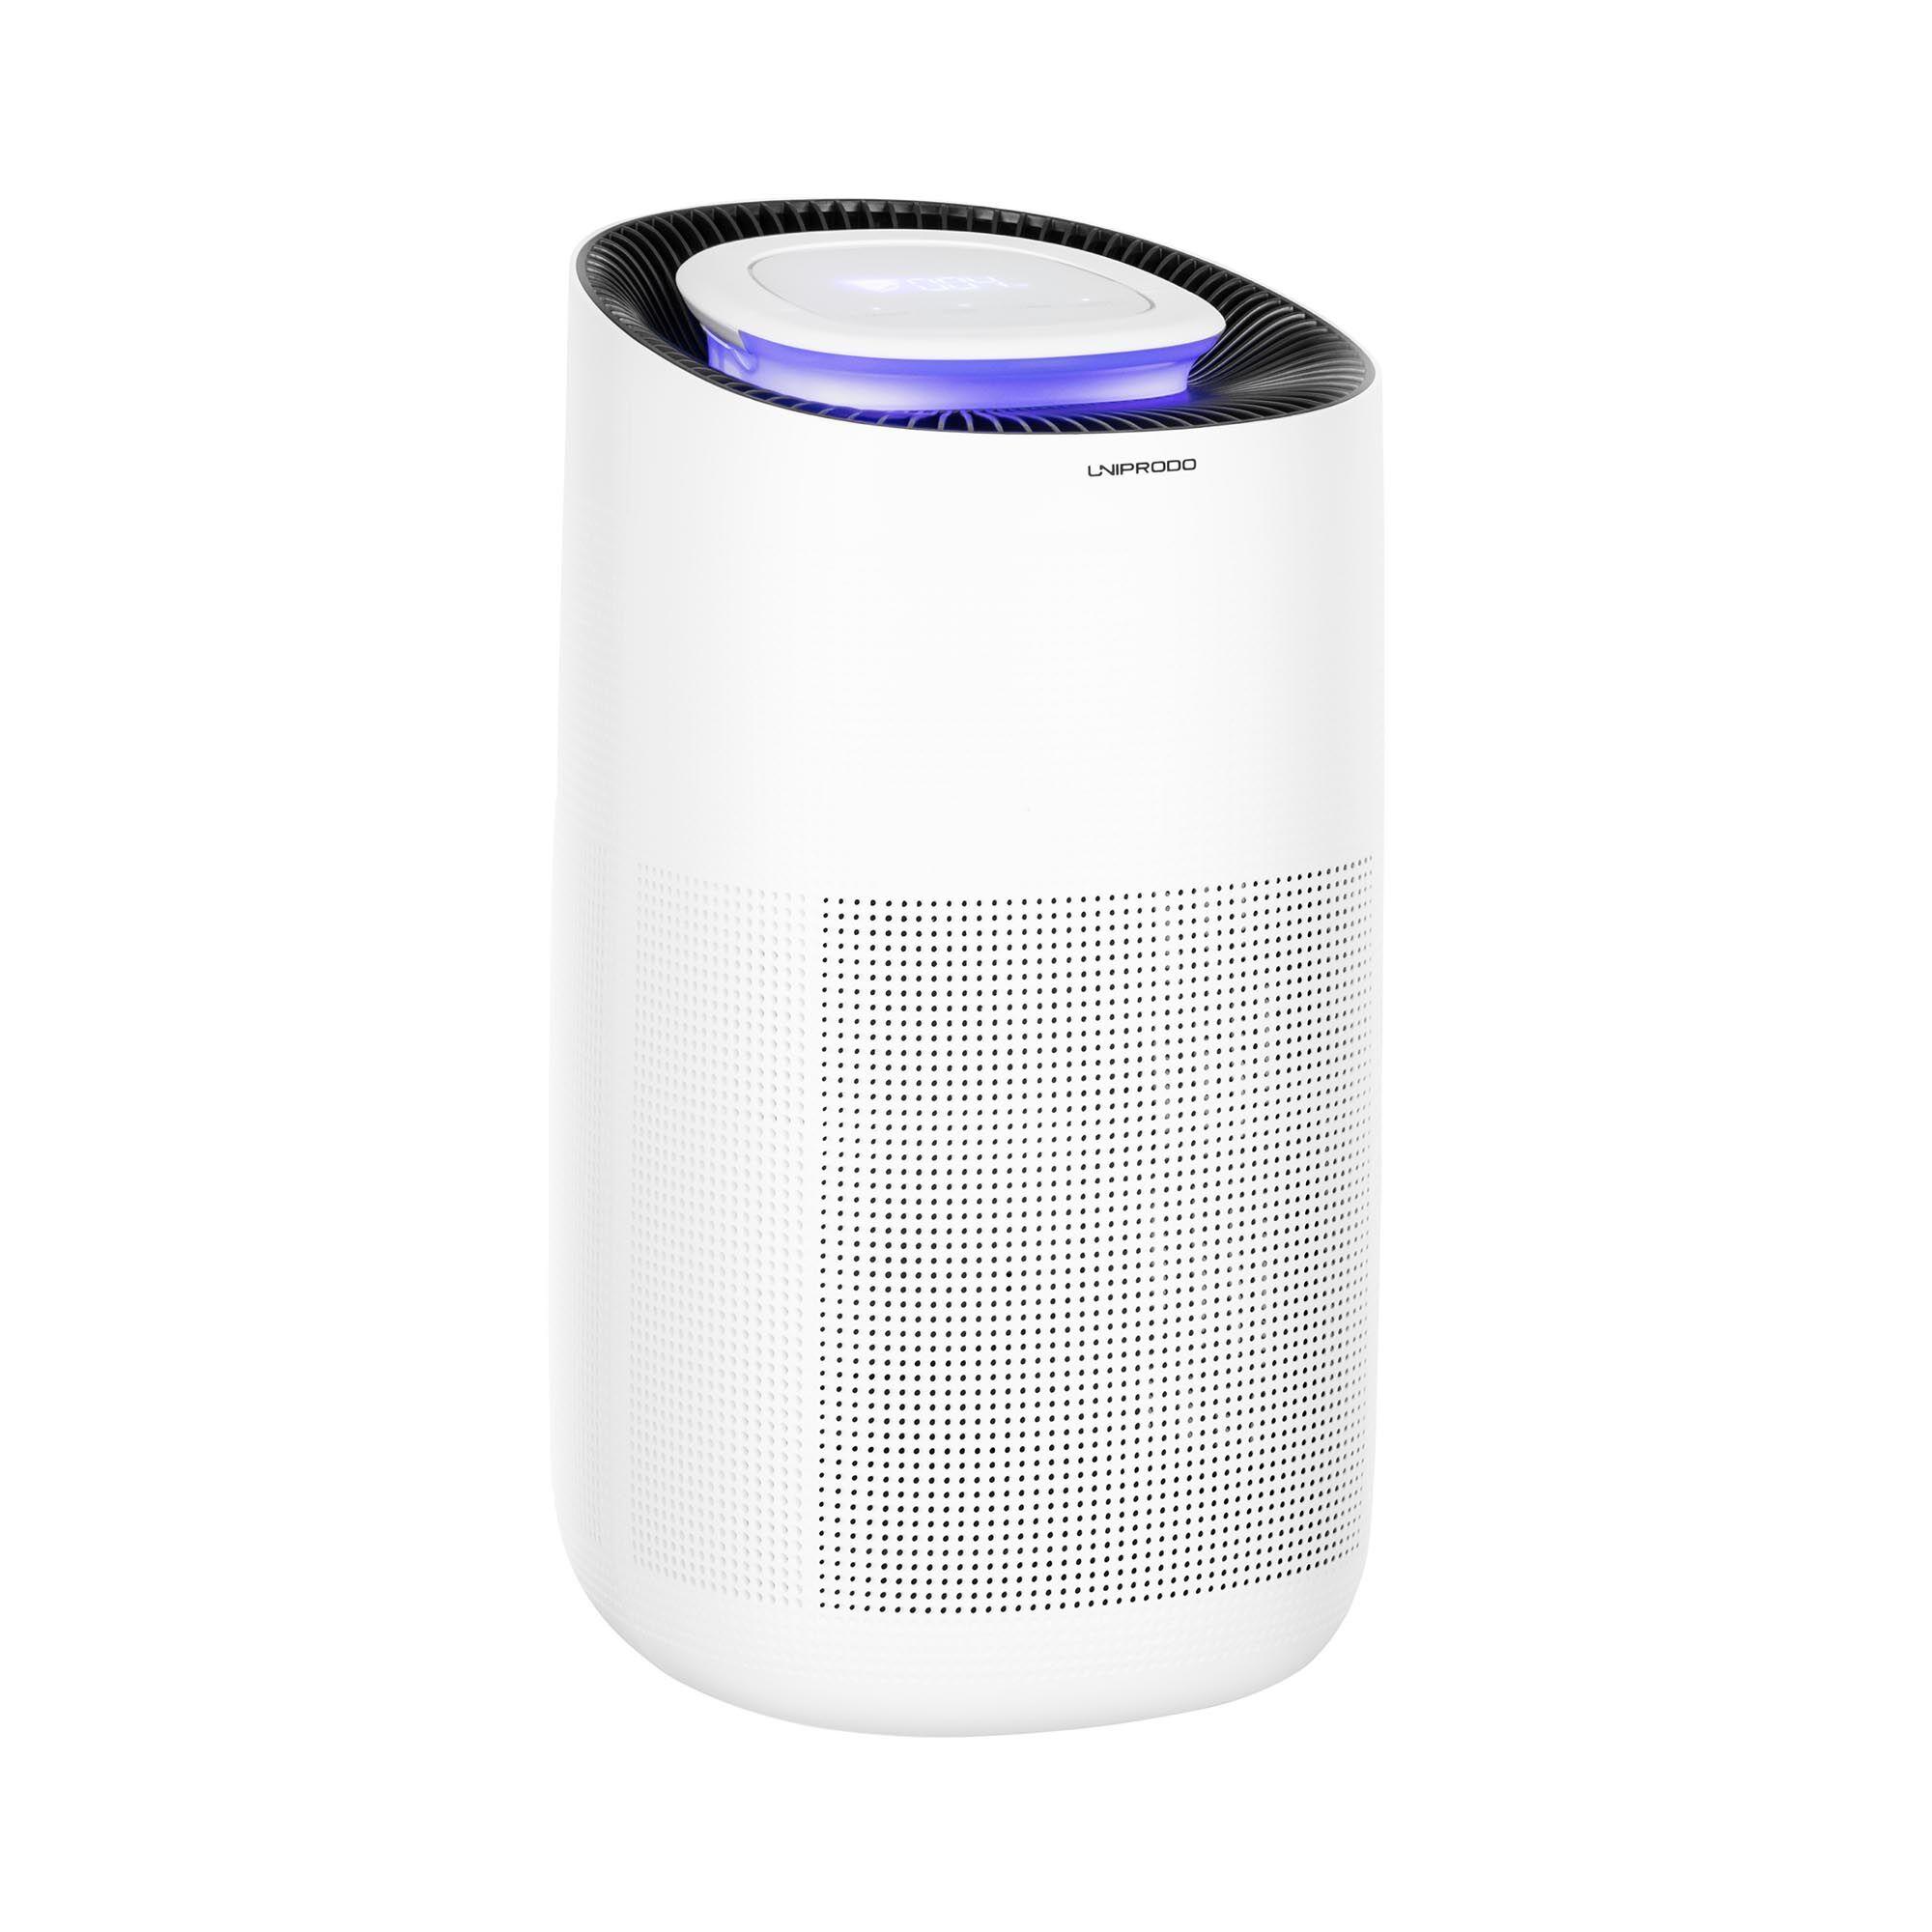 uniprodo purificatore aria - 50 m² uni_air purifier_02